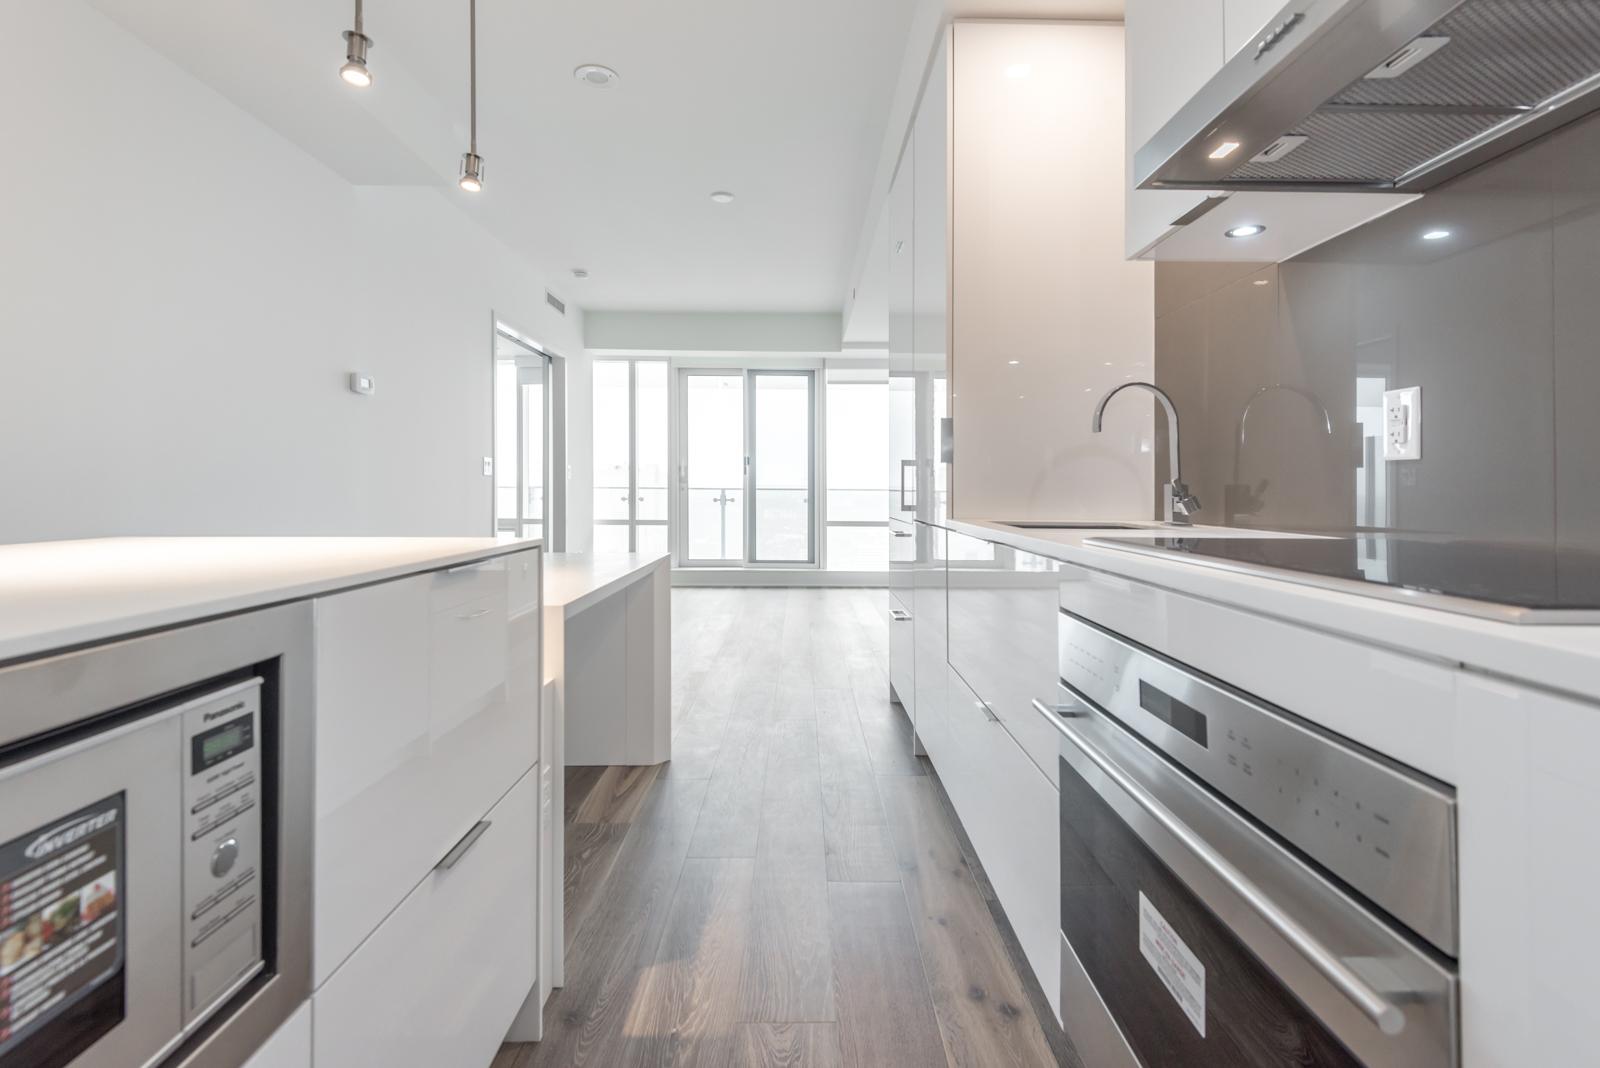 Photo showing kitchen island and stove